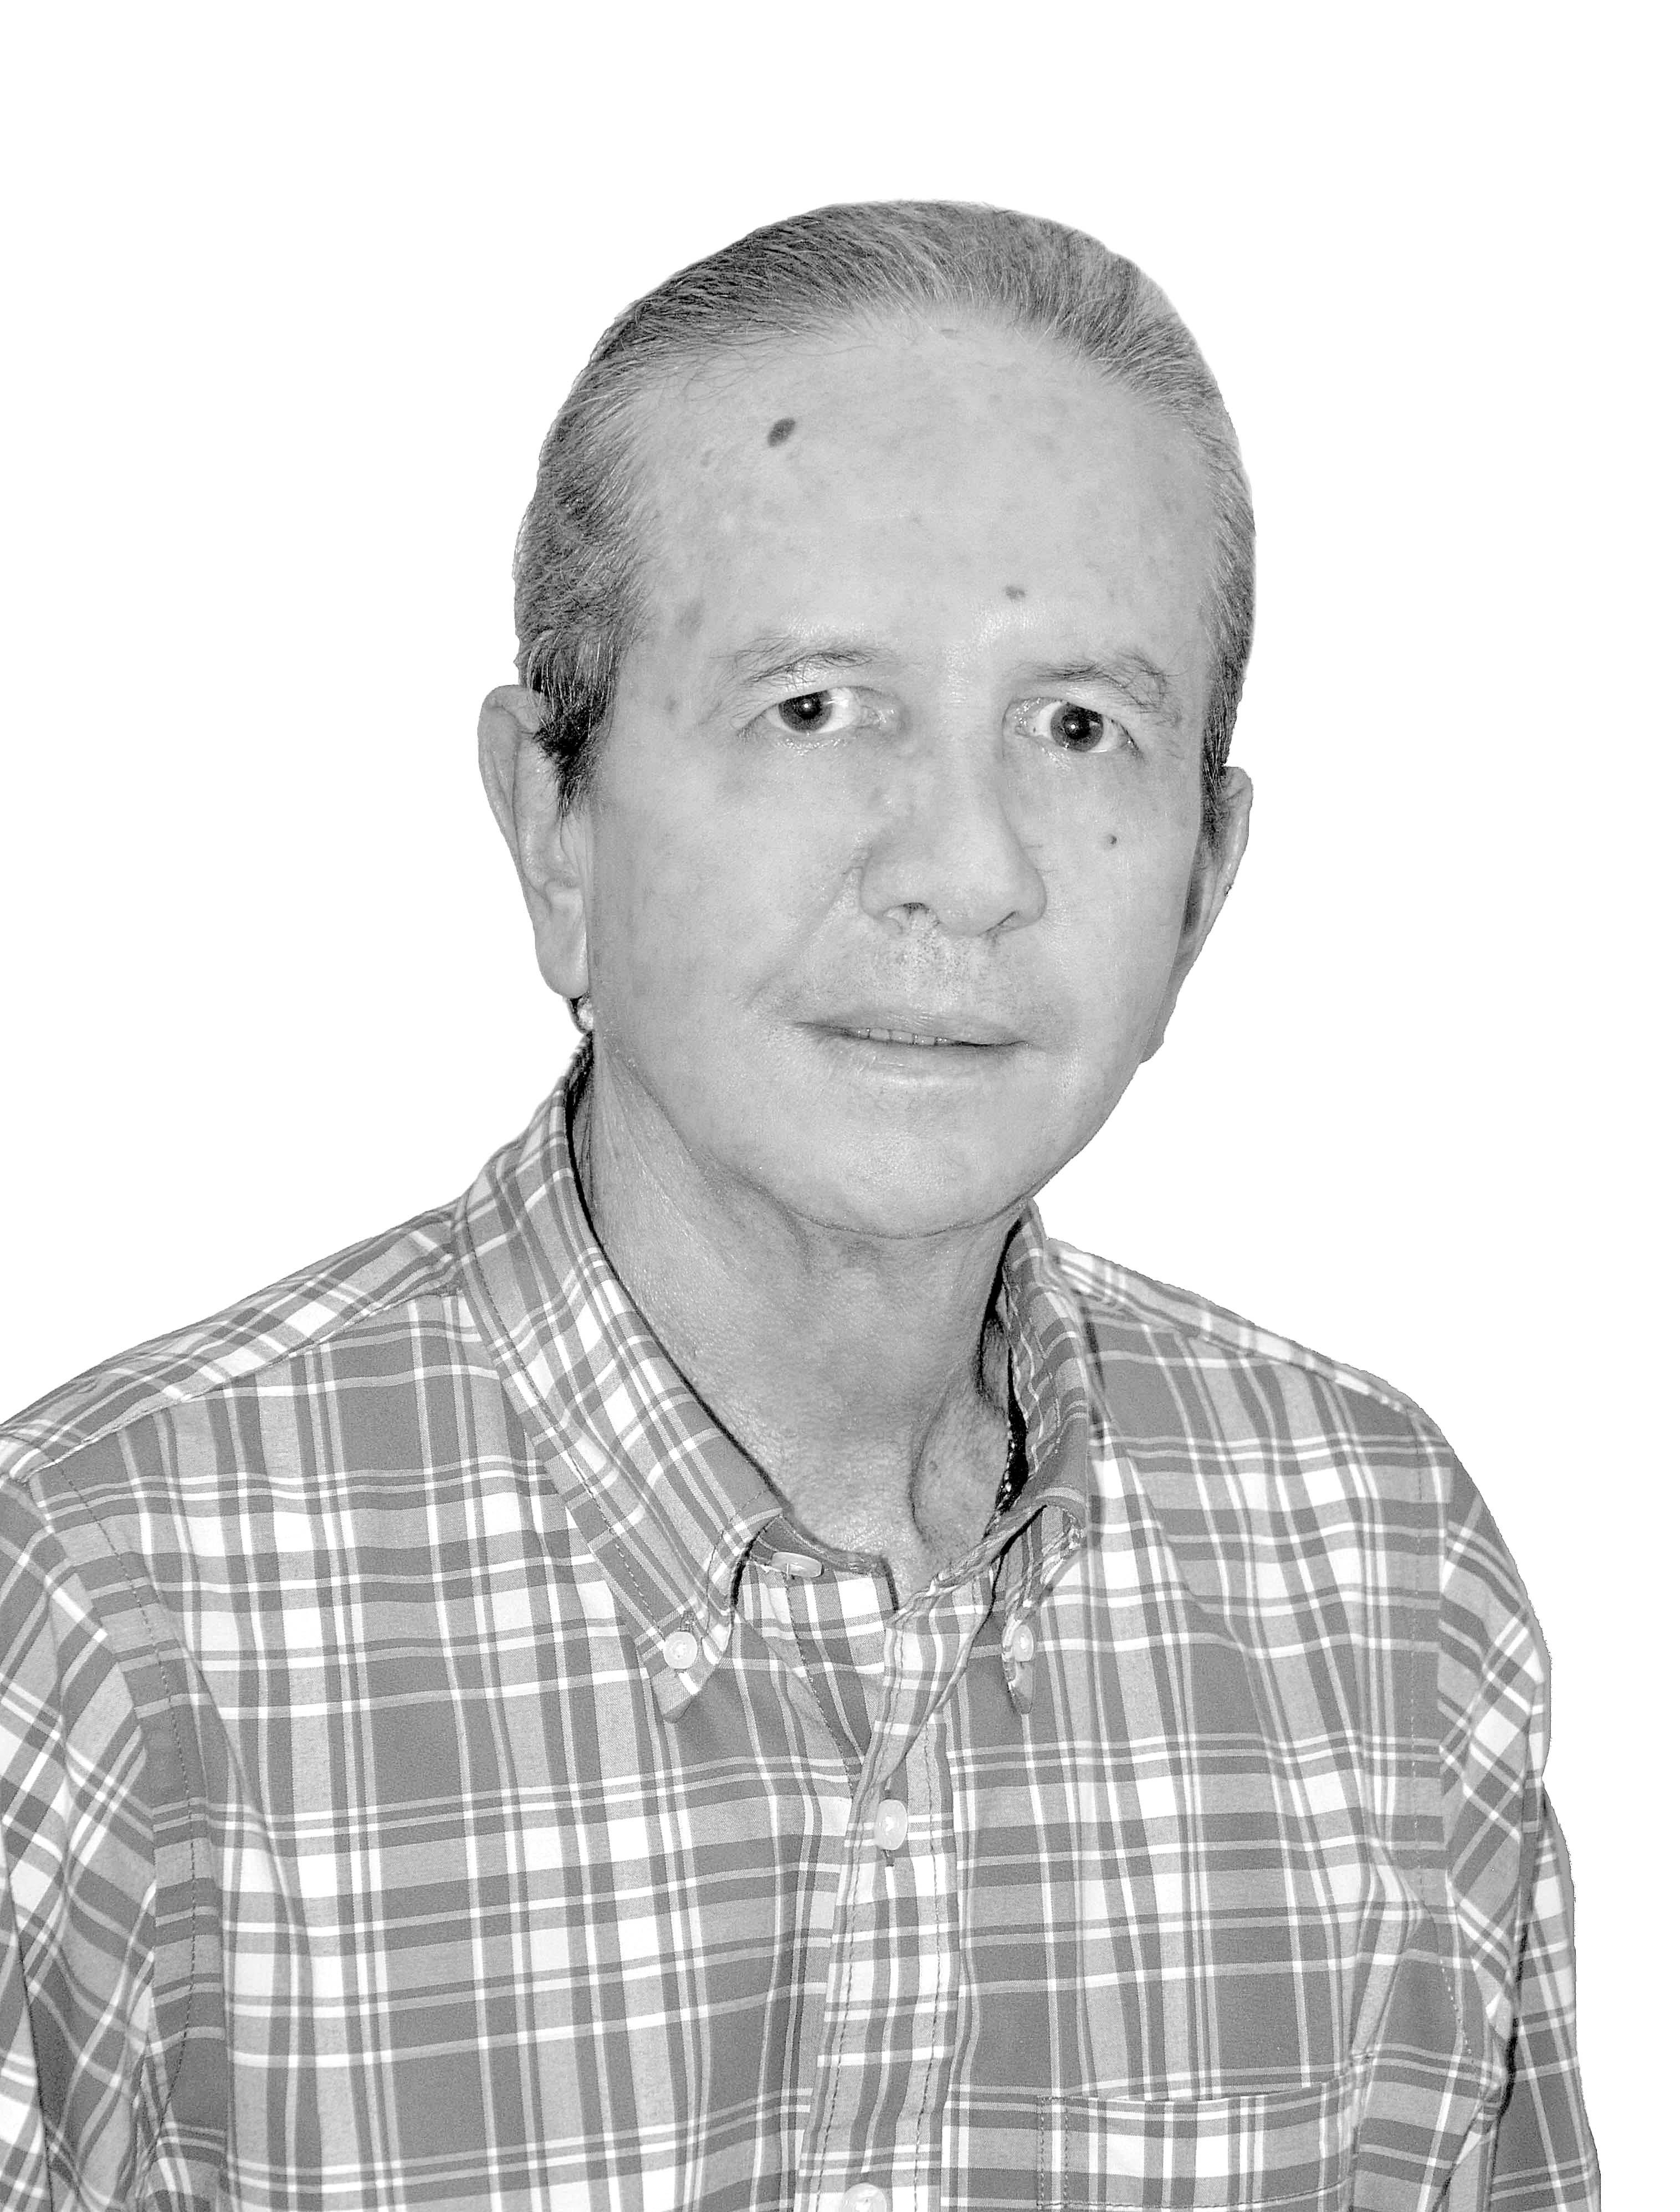 Pecadores que absuelven Por: Héctor Gómez Kabariq | EL FRENTE